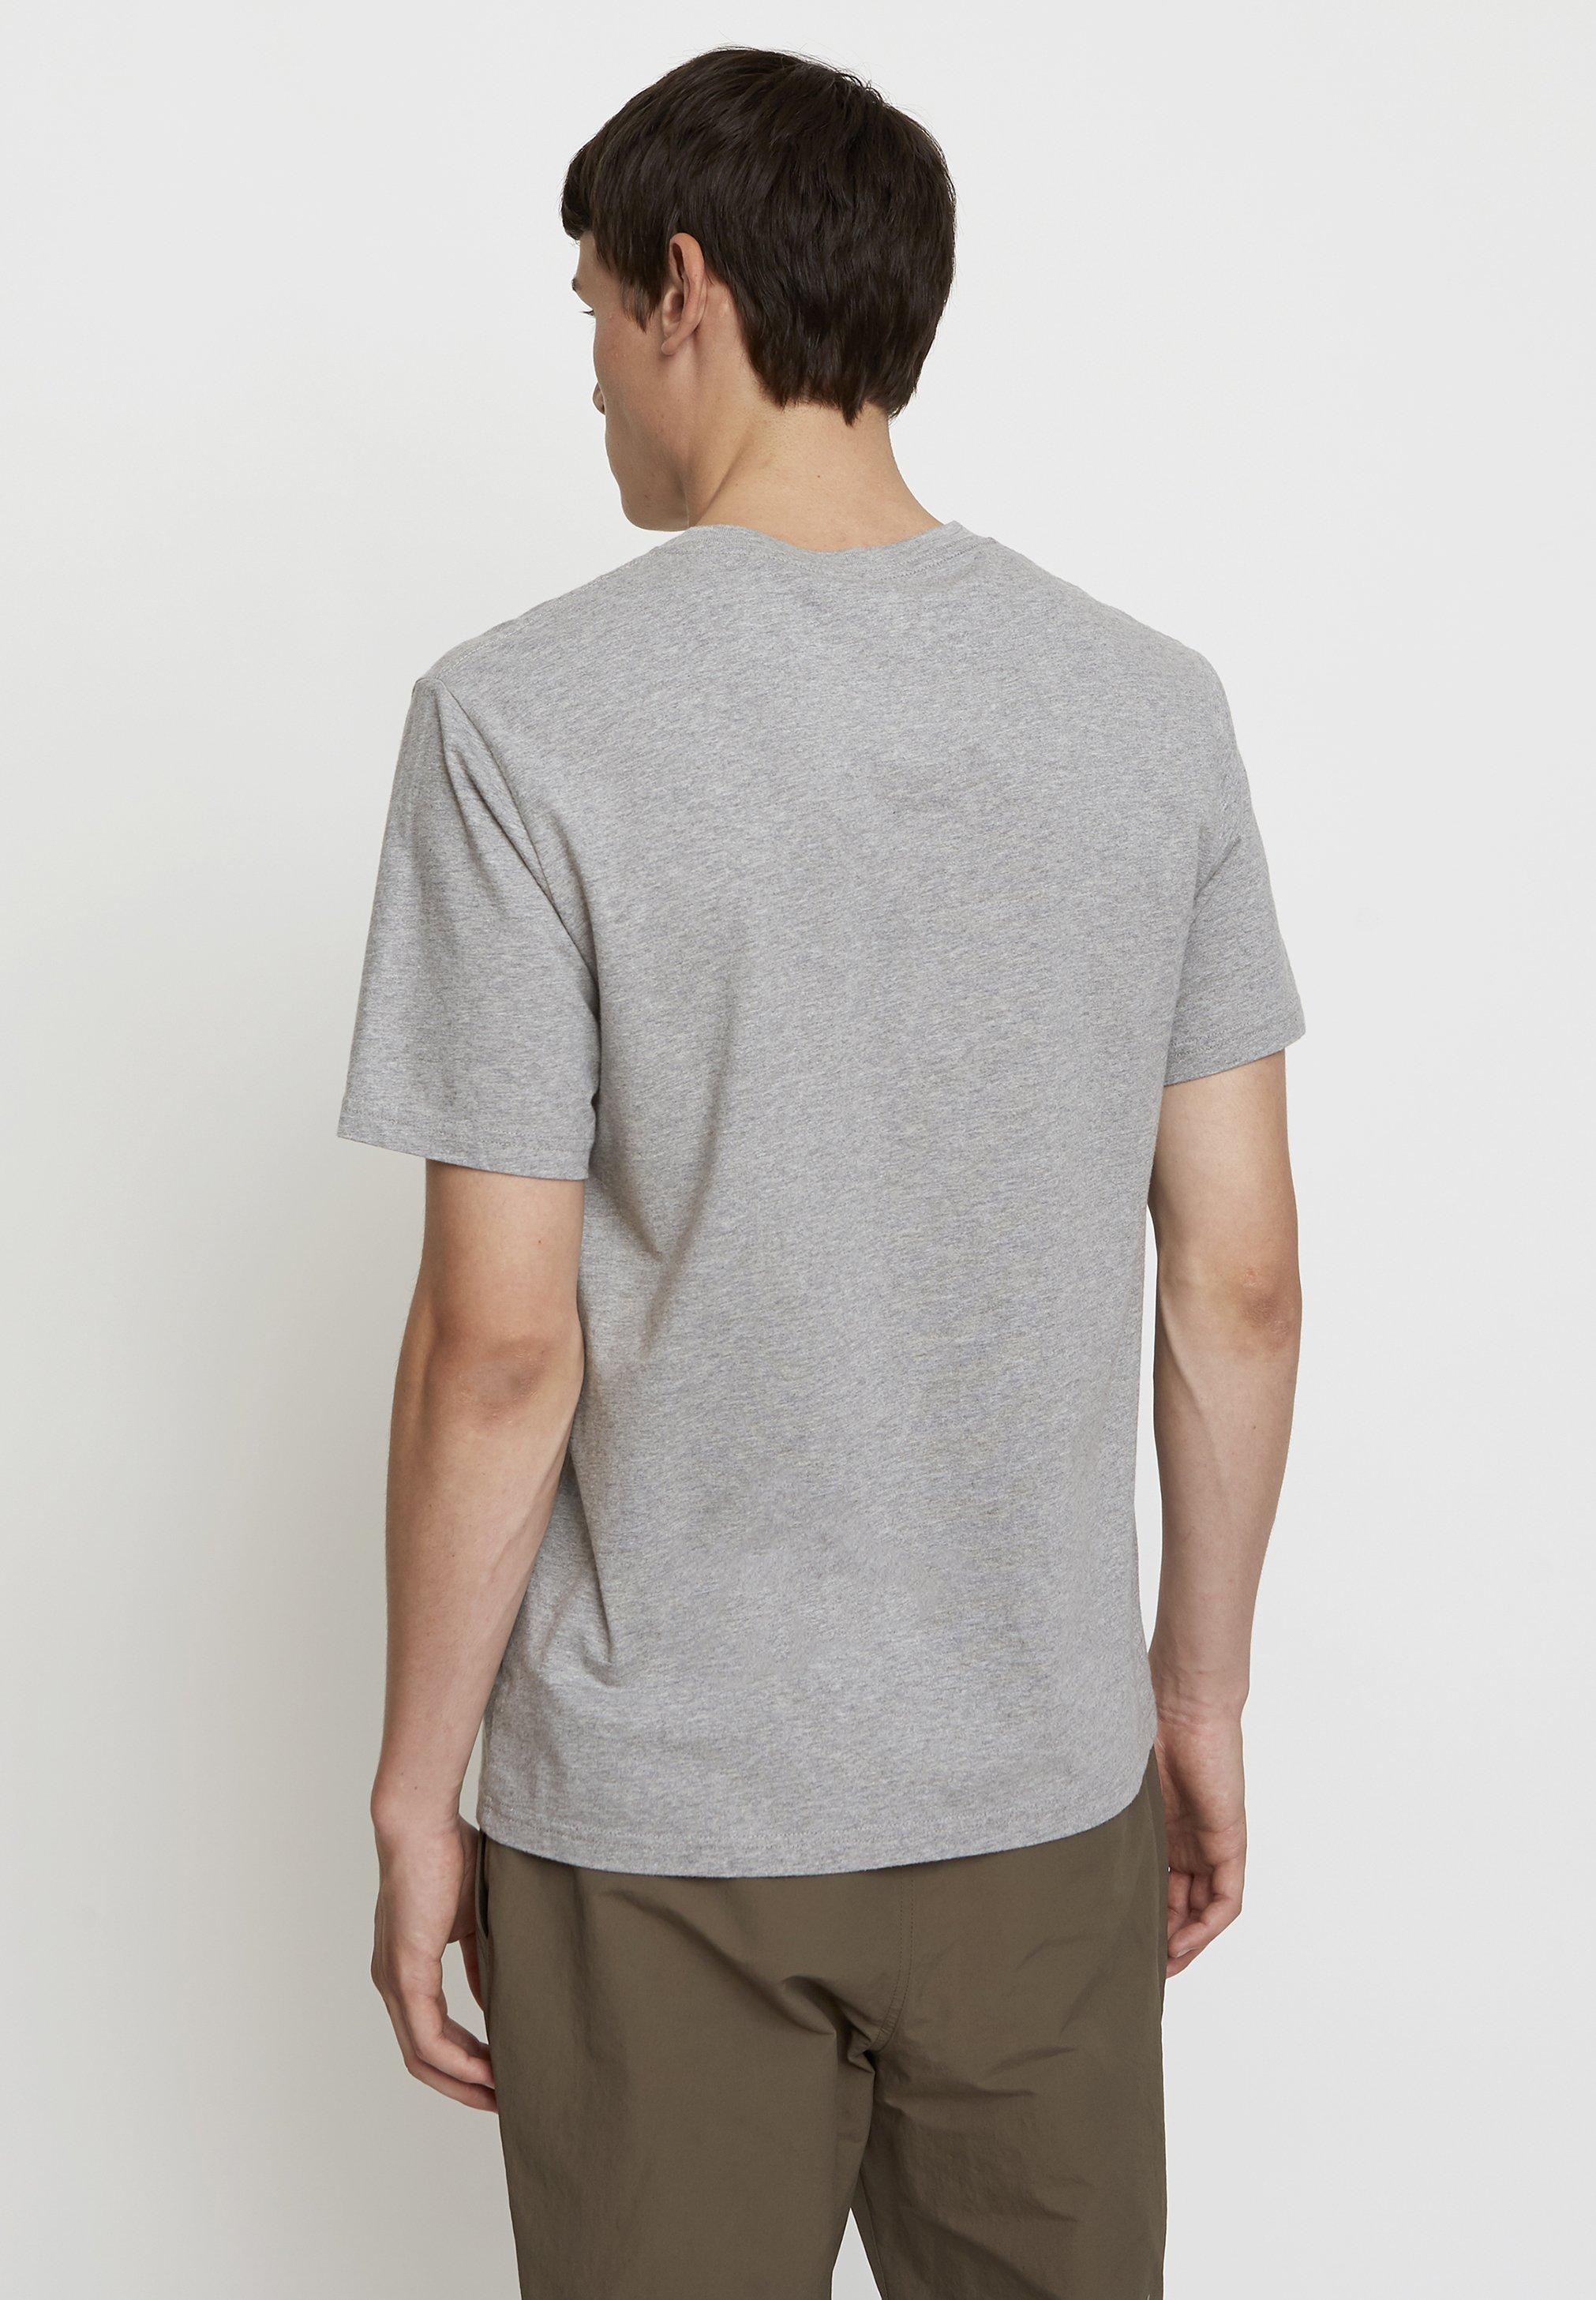 Timberland Woodwood - T-shirt Med Print Grey